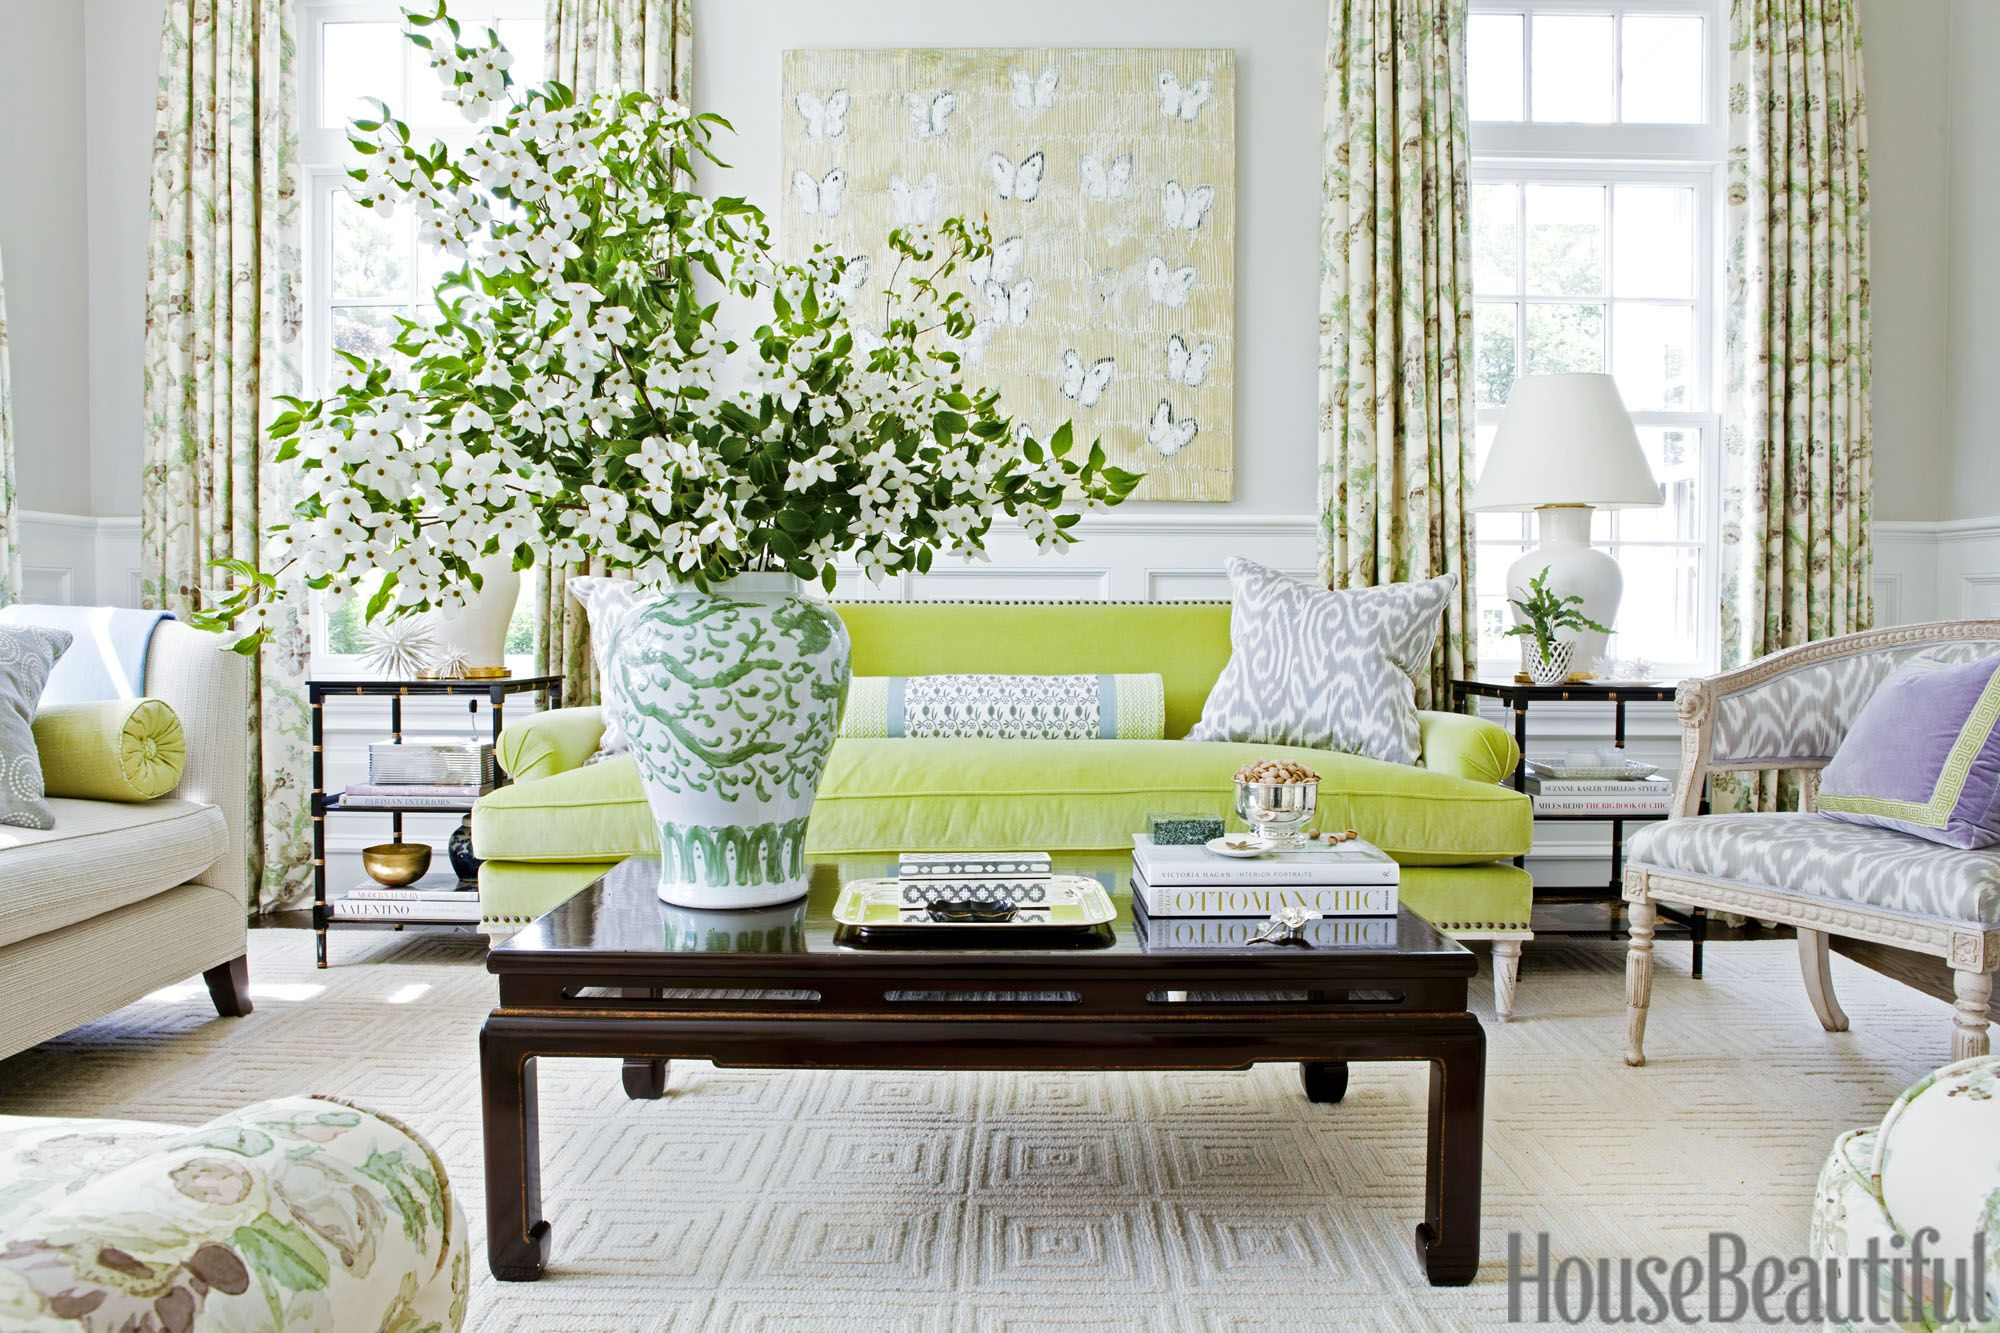 Ashley Whittaker Mesmerizing Designer Ashley Whittaker Decorates This Westchester County Home Design Ideas